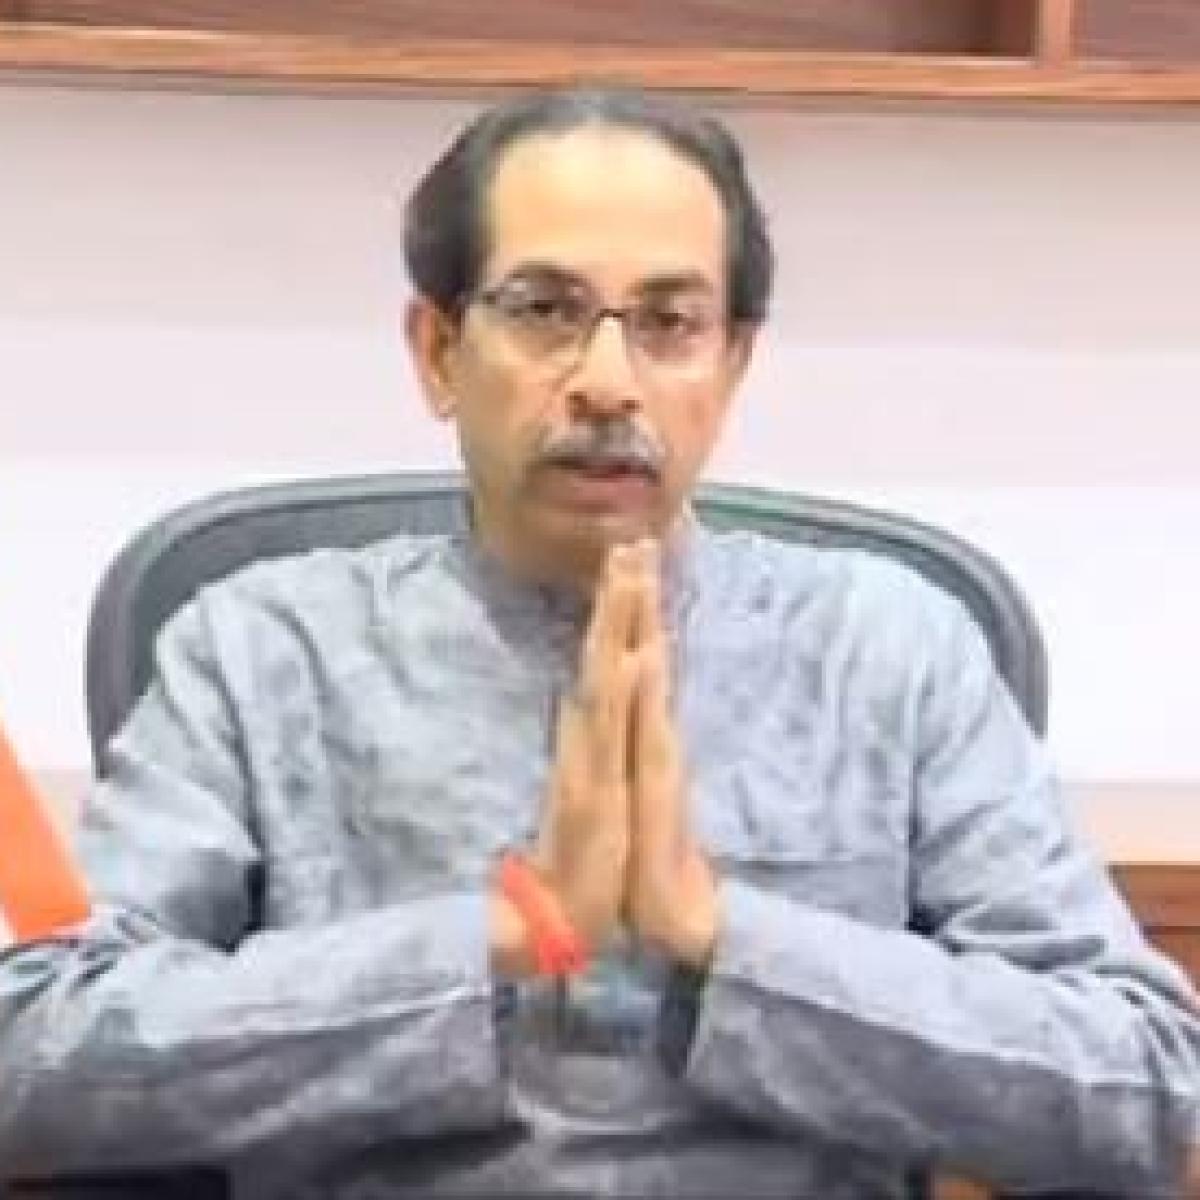 Coronavirus in Mumbai: Maha CM Uddhav Thackeray urges police to show restraint in lockdown implementation